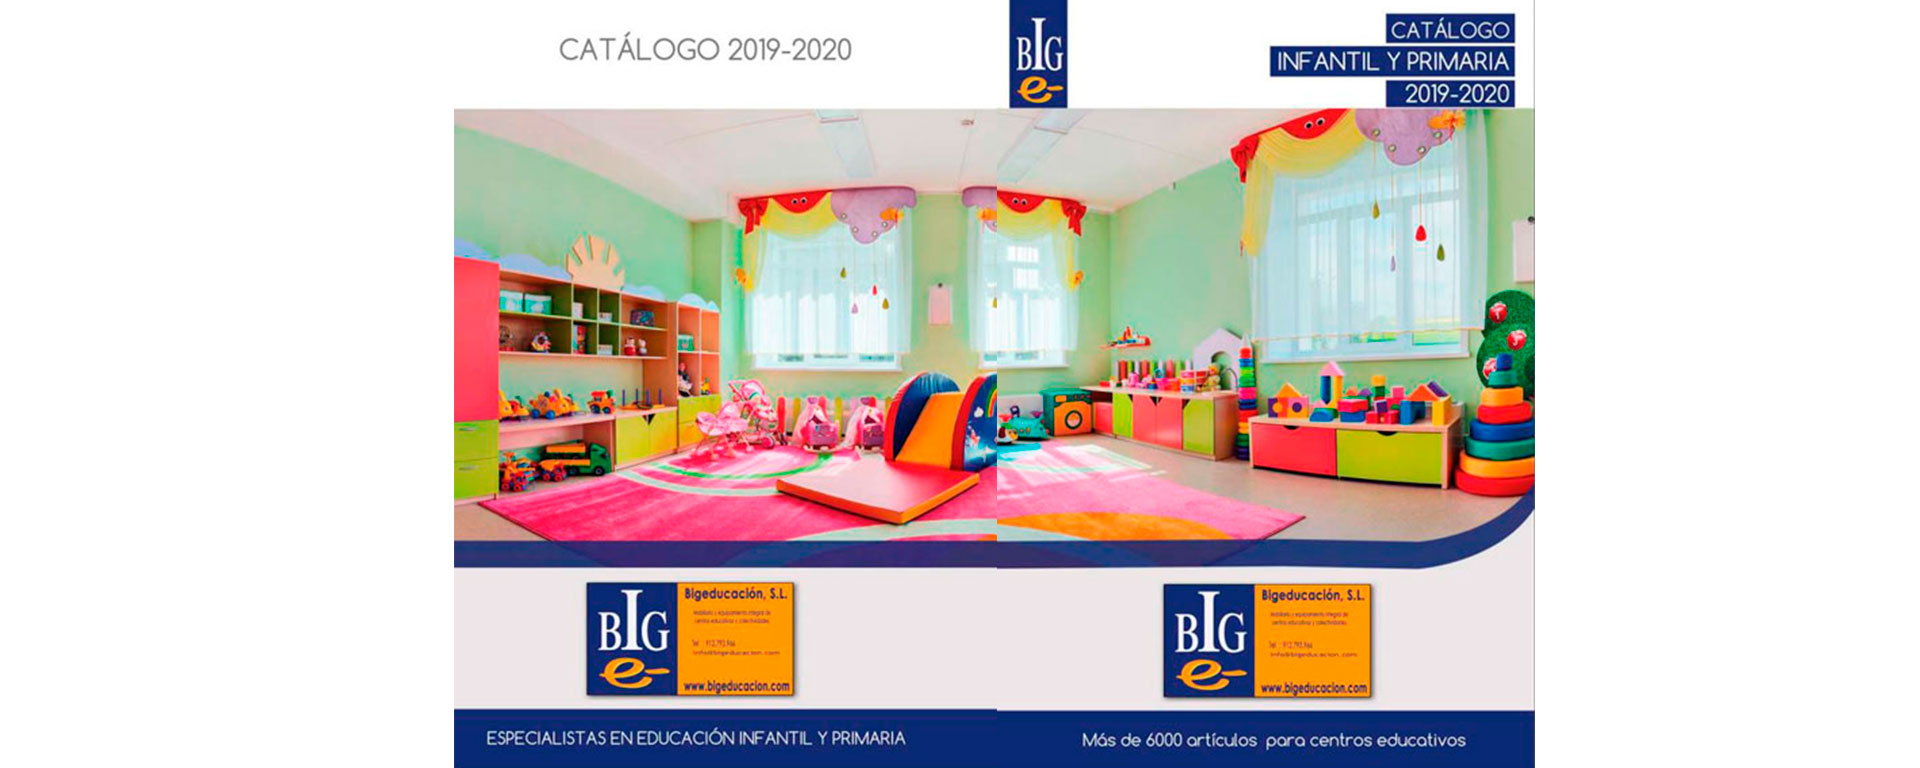 Catálogo Infantil primaria 2019-2020